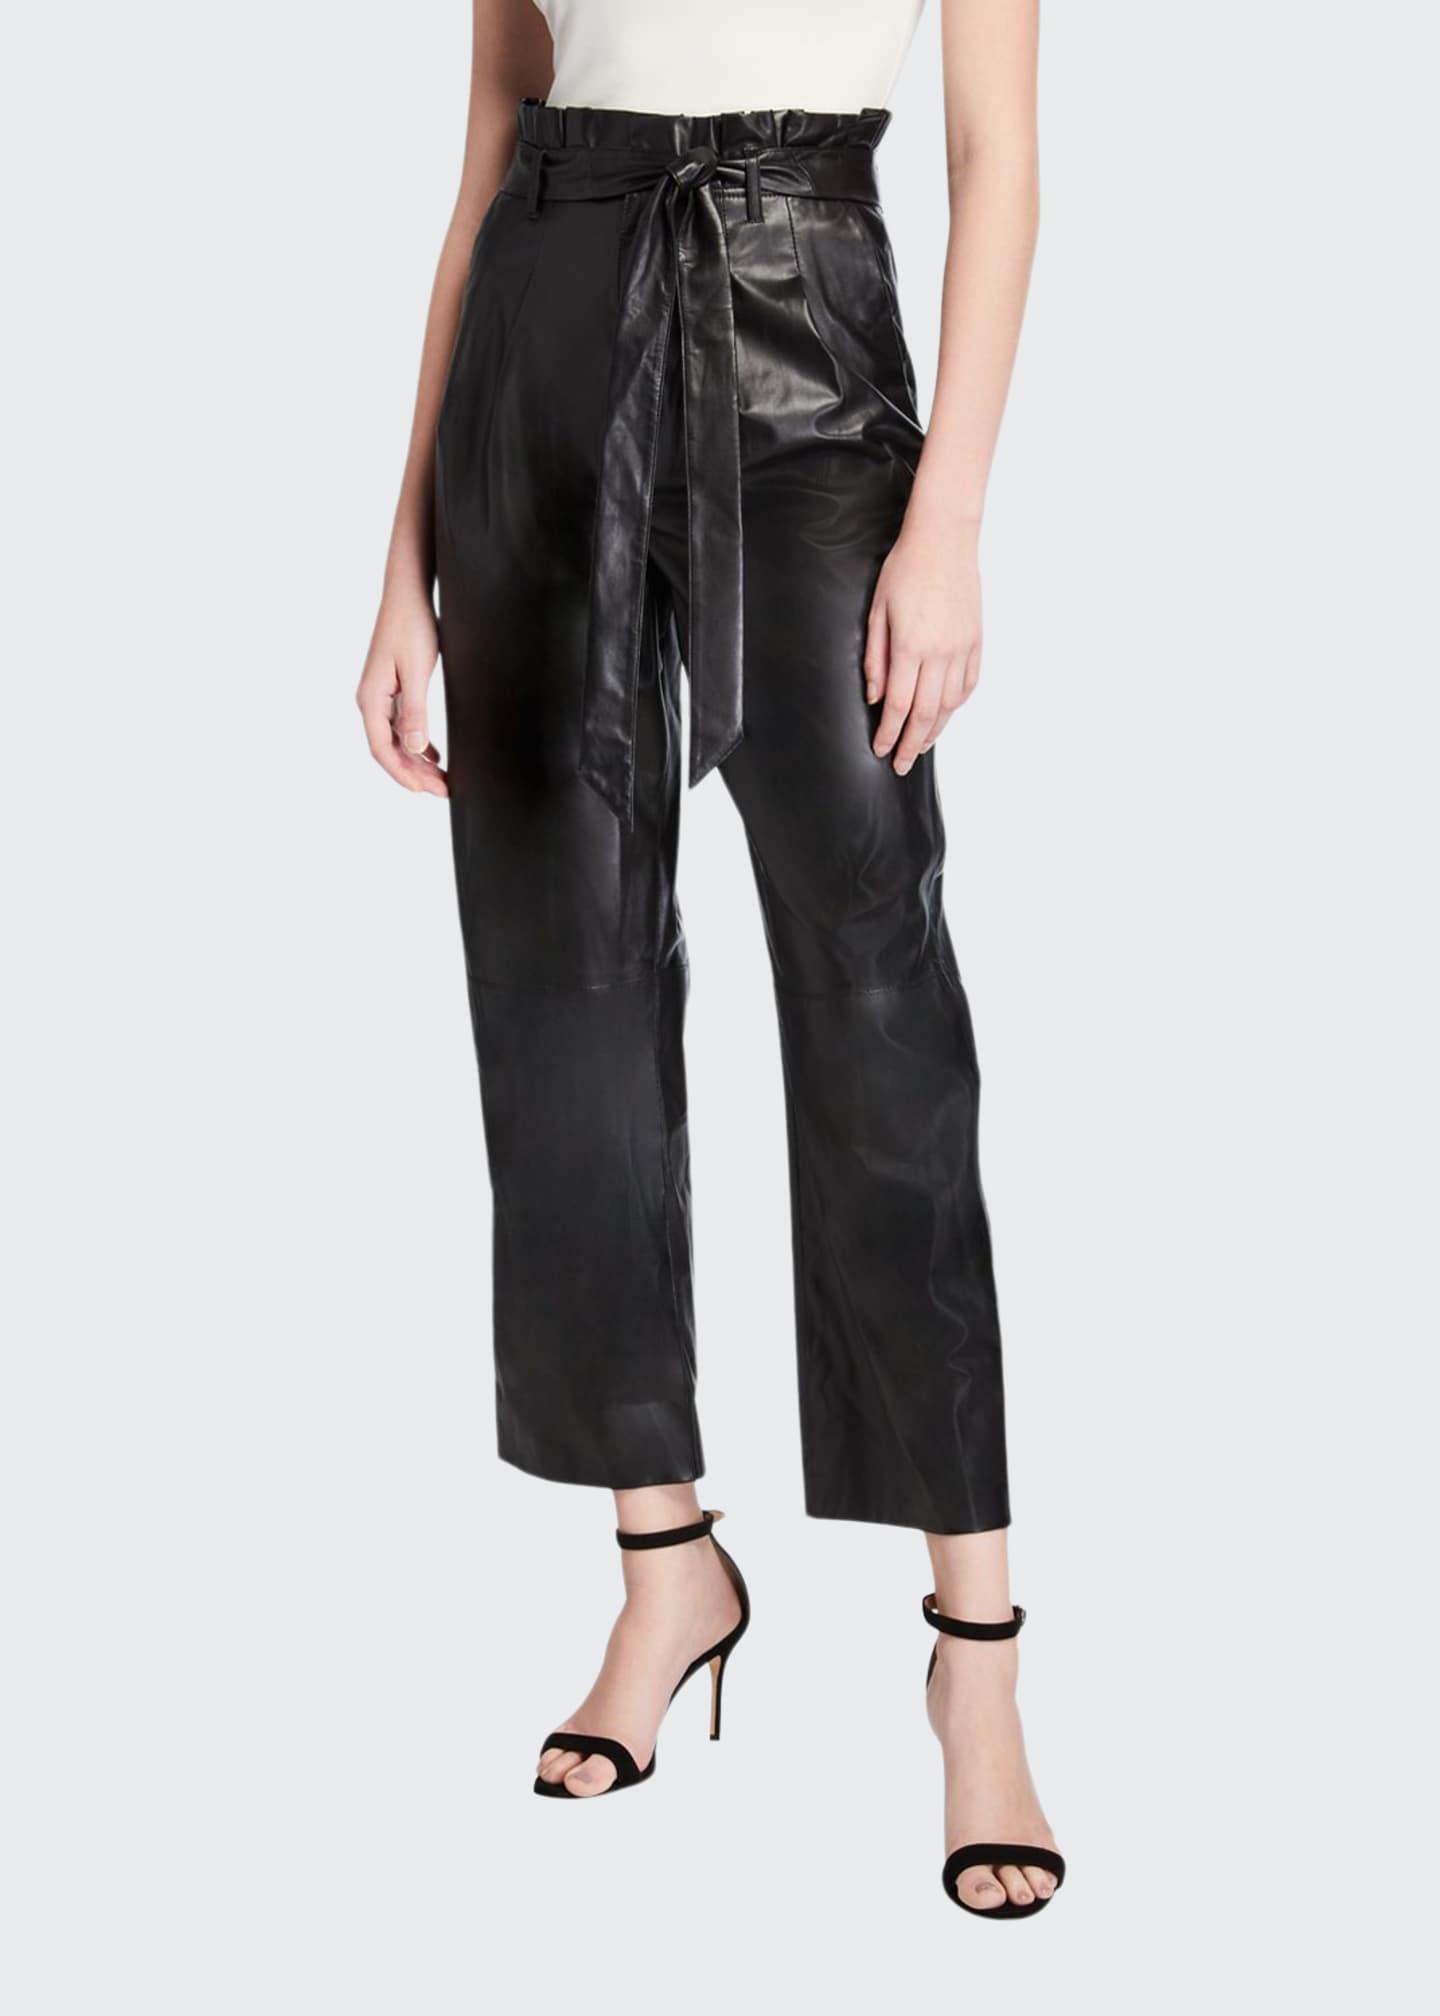 Alice + Olivia Ryan Leather Paperbag Ankle Pants